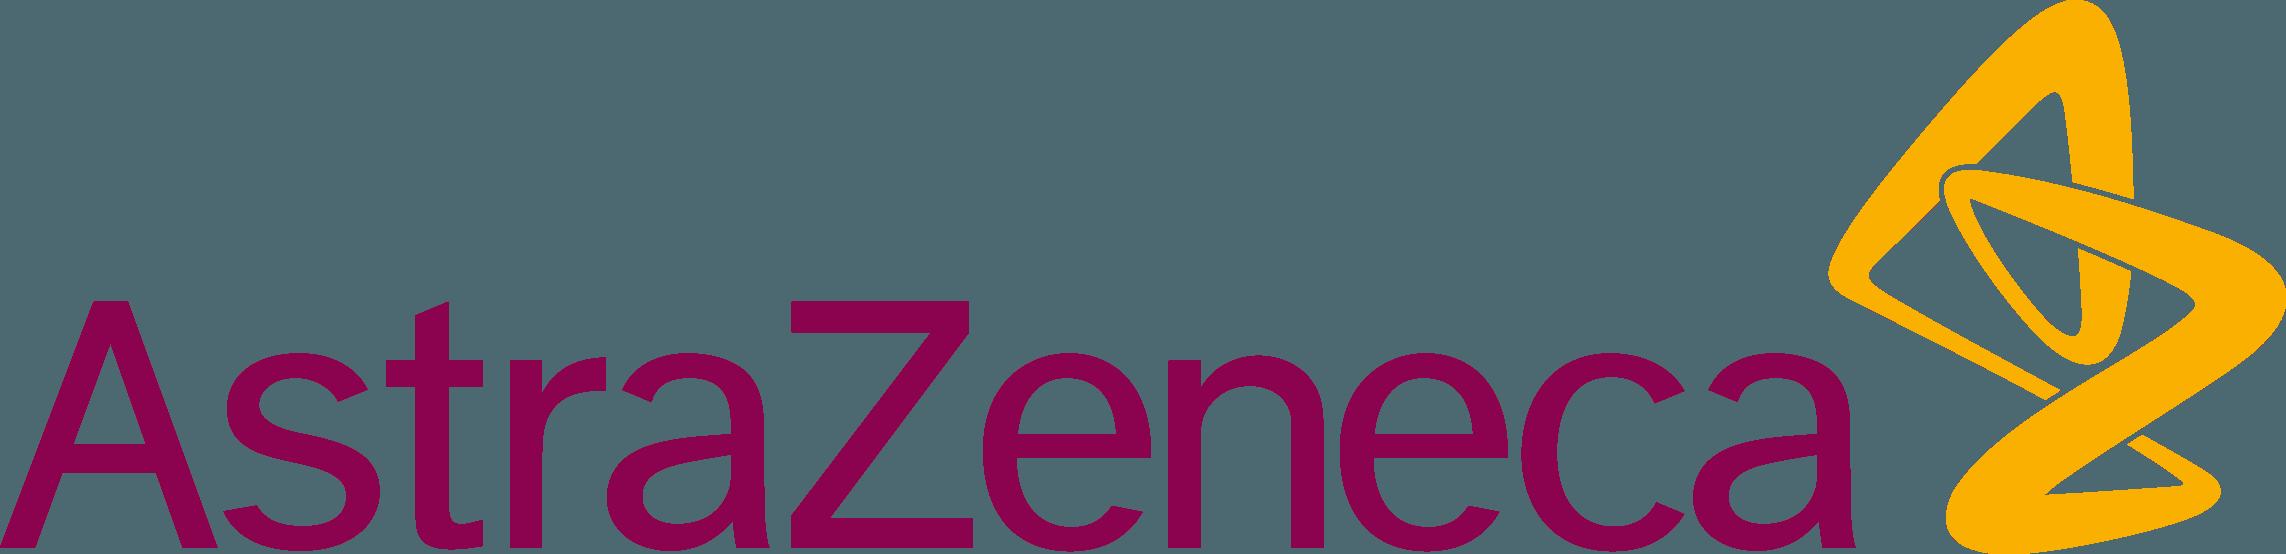 AstraZeneca Logo Vector EPS Free Download, Logo, Icons, Brand Emblems